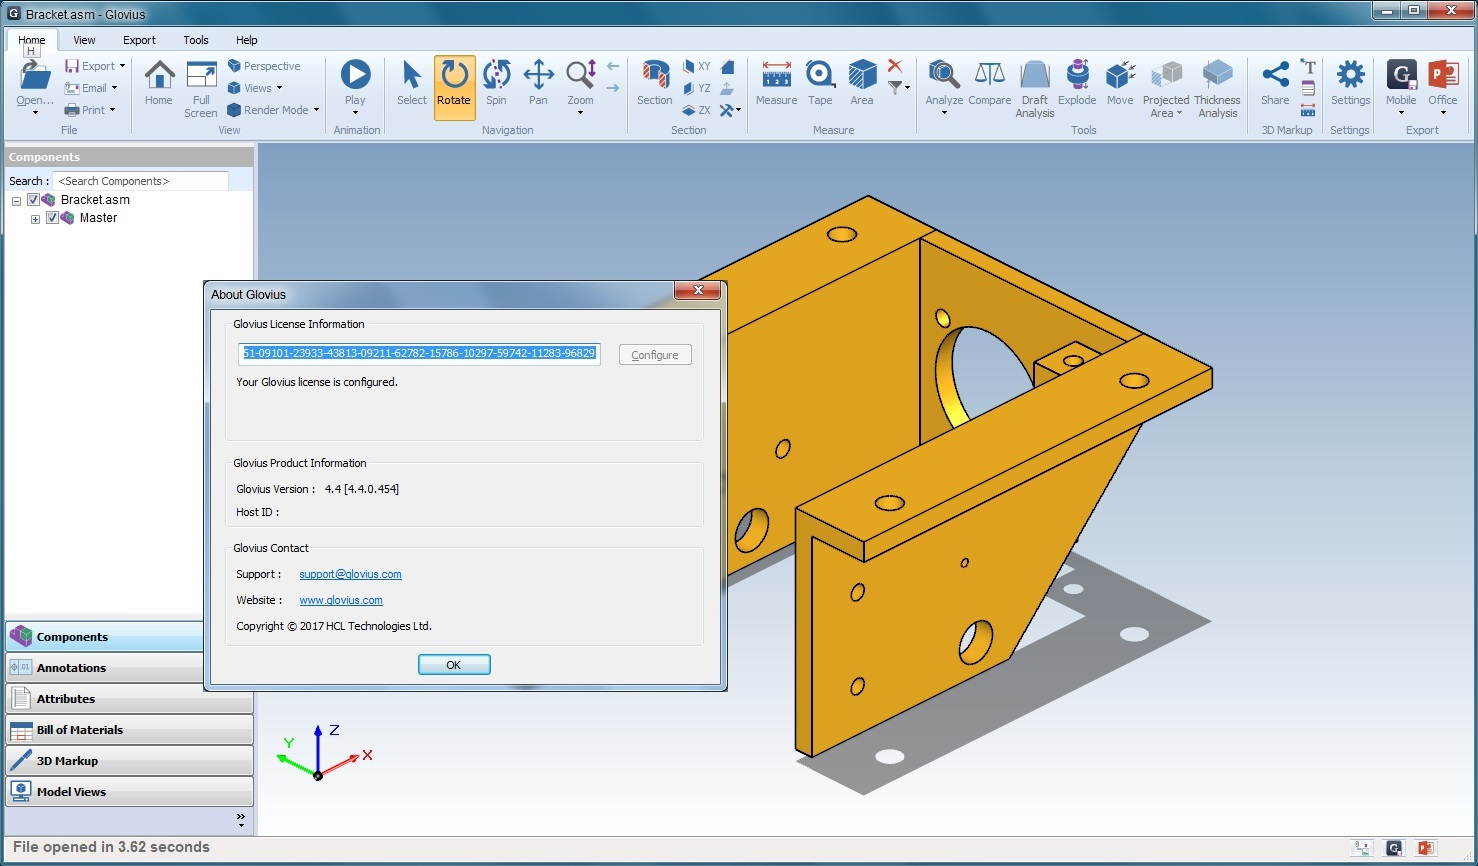 Working with Geometric Glovius Pro v4.4.0.454 full license